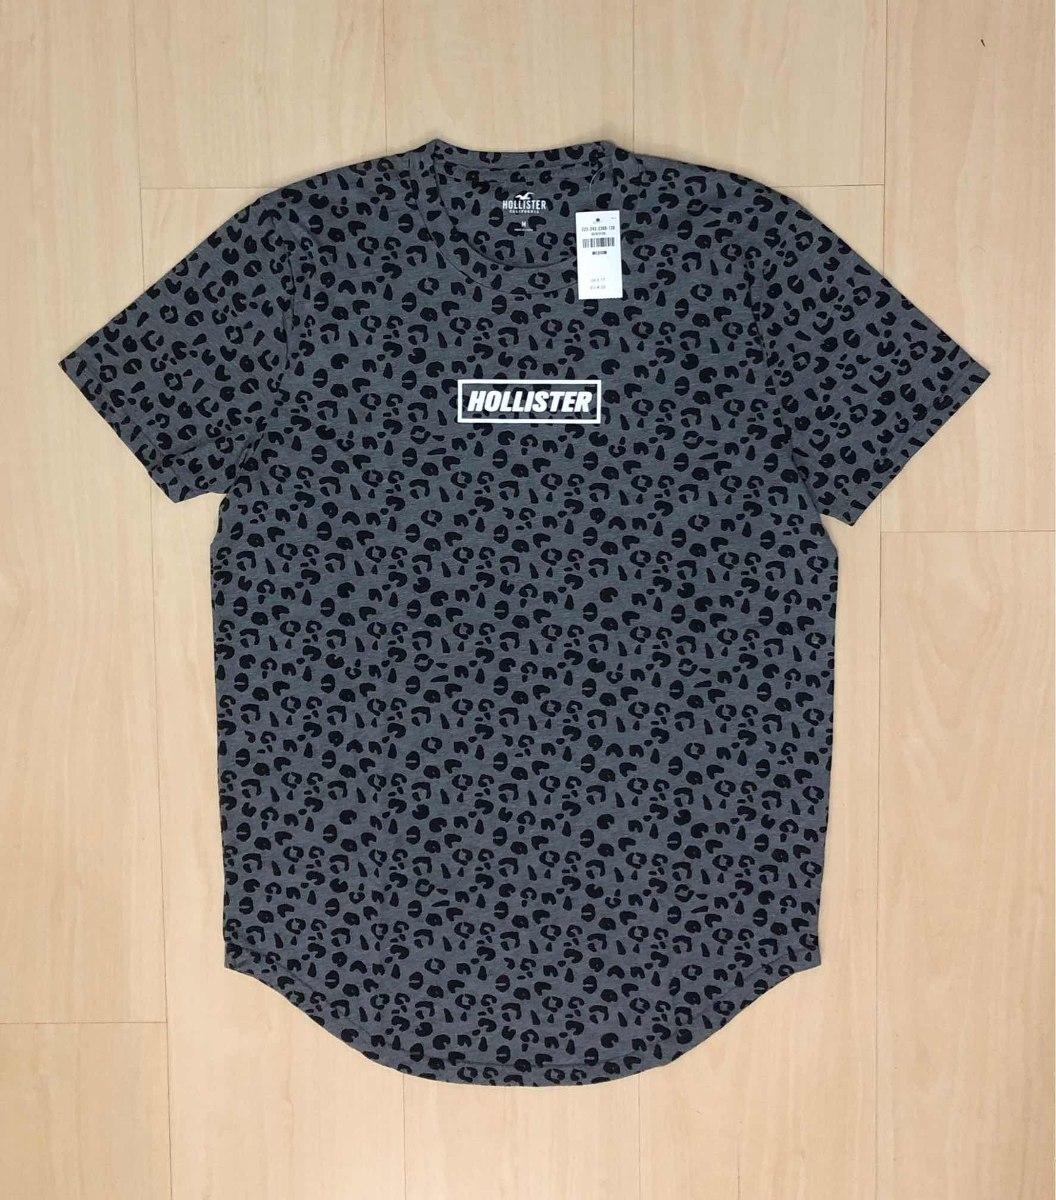 Camiseta Masculina Hollister Barra Redonda Importada Eua - R  89,00 ... b51c77a055